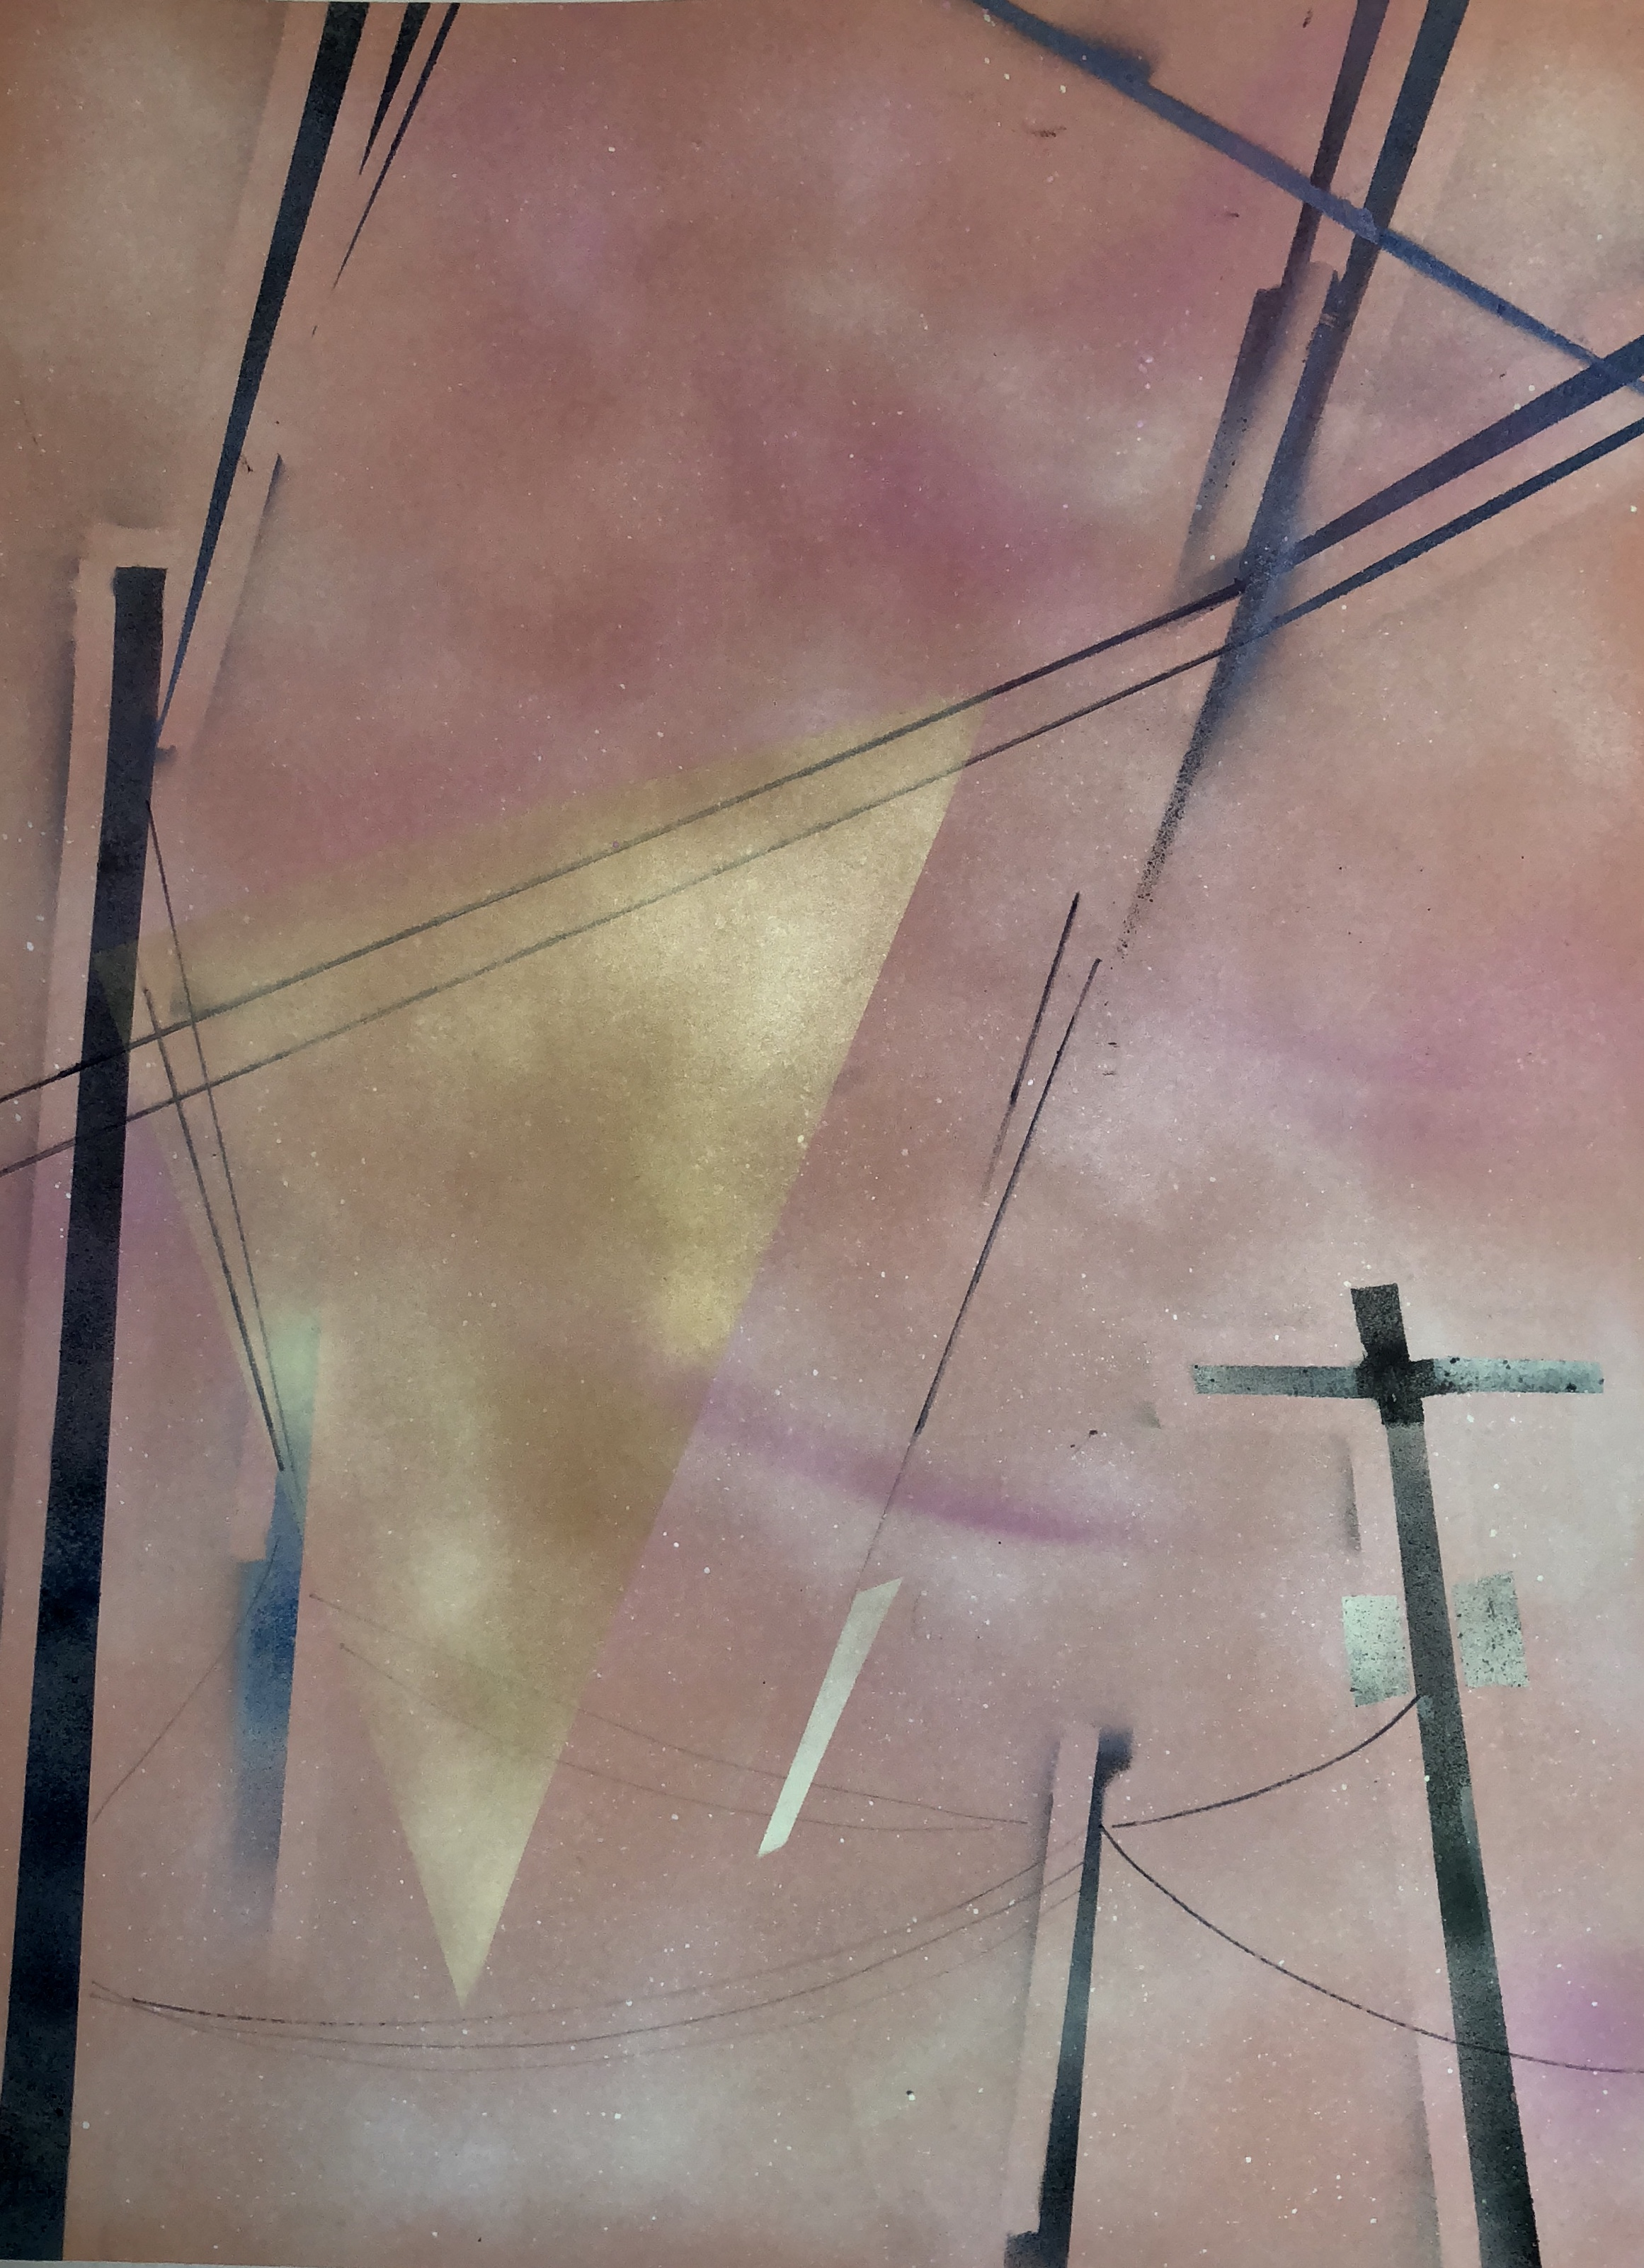 "Street Stitch 1  , Spray Paint and Sharpie Marker on Paper, 30"" x 22"", 2018."